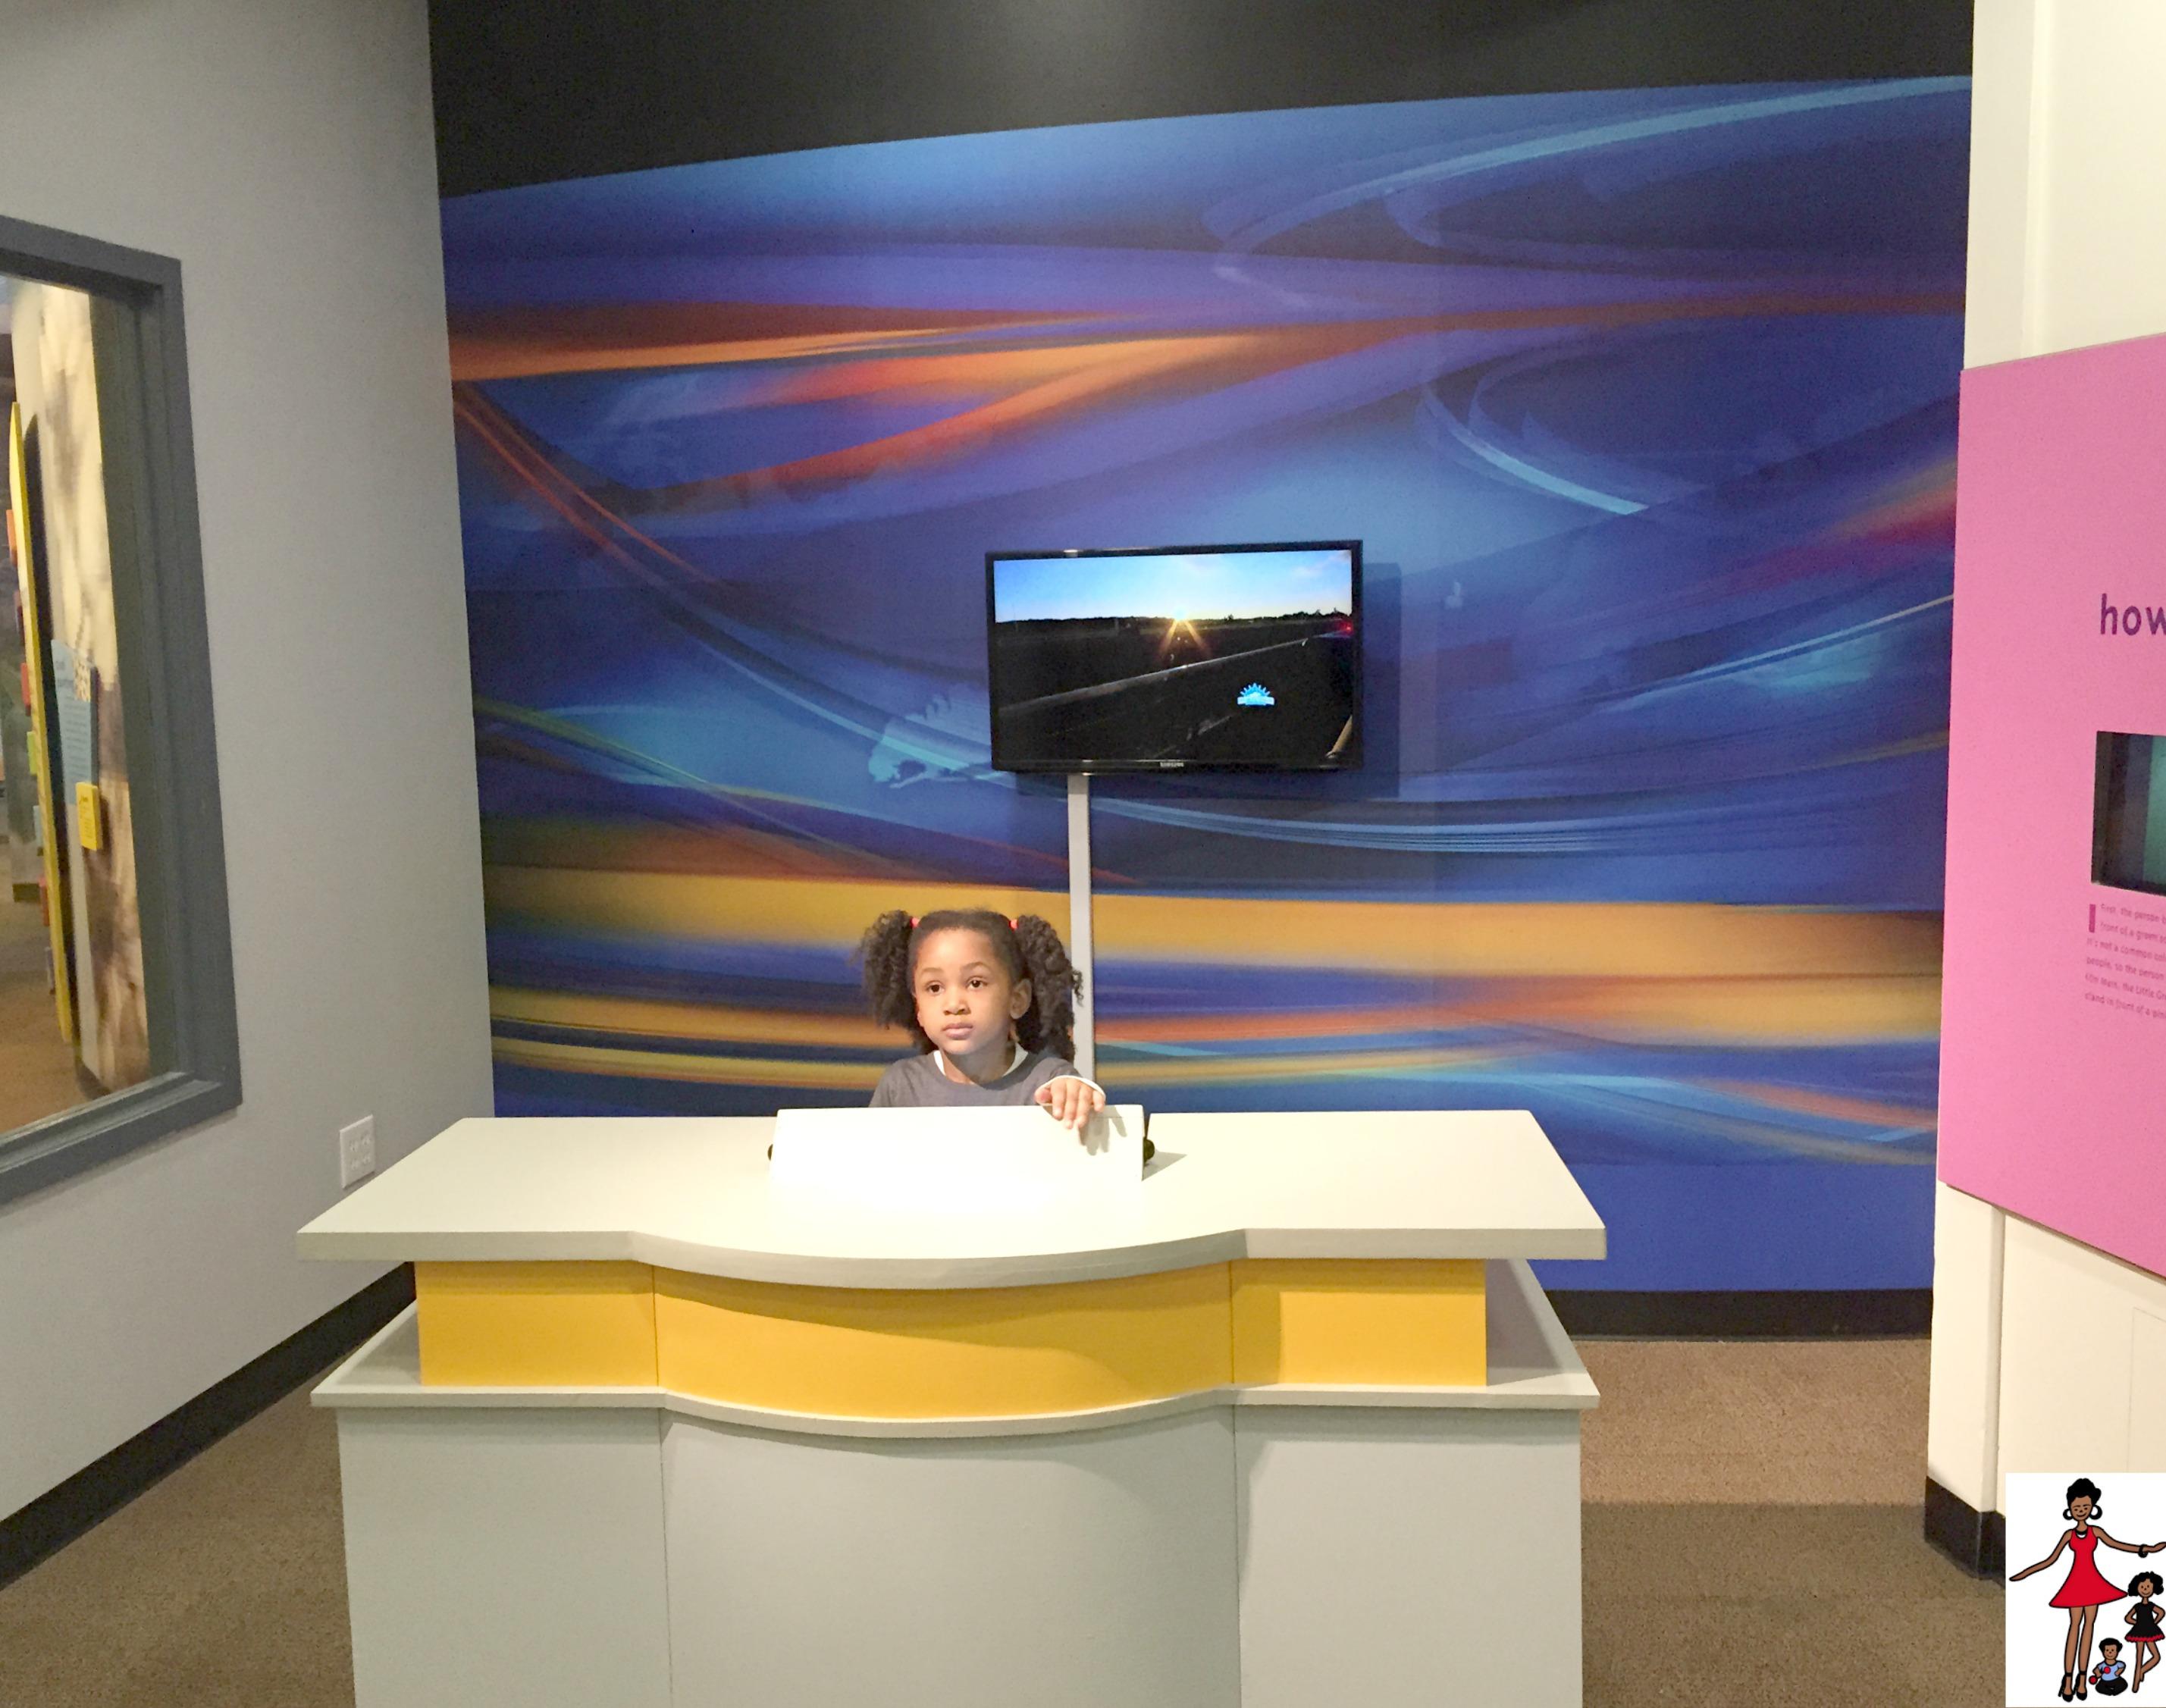 longislandchildrenmuseum-communication-center